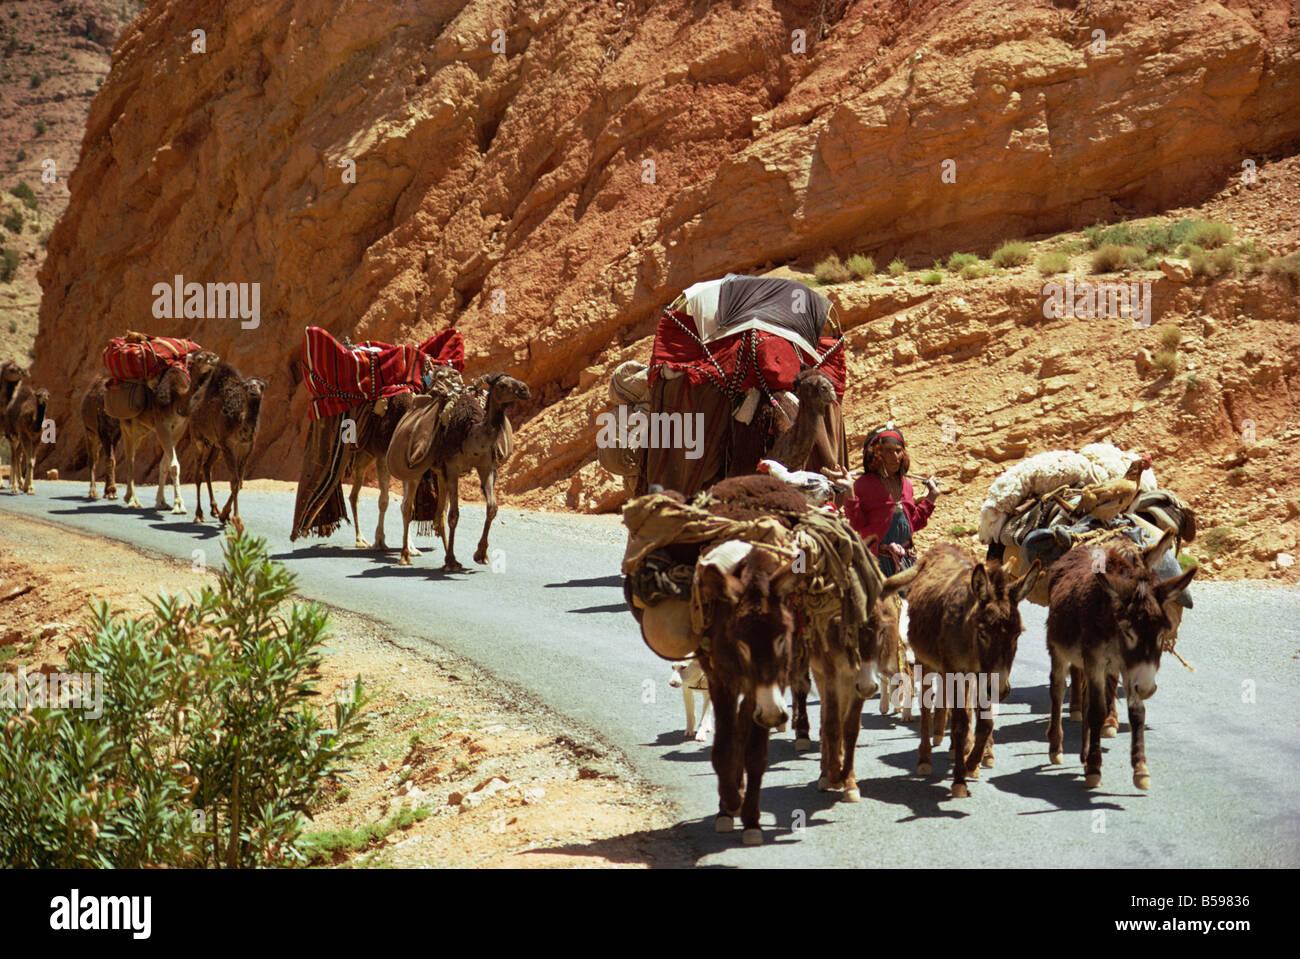 Oued Abiod Gorge, montañas Aures, Argelia, Norte de África, África Imagen De Stock